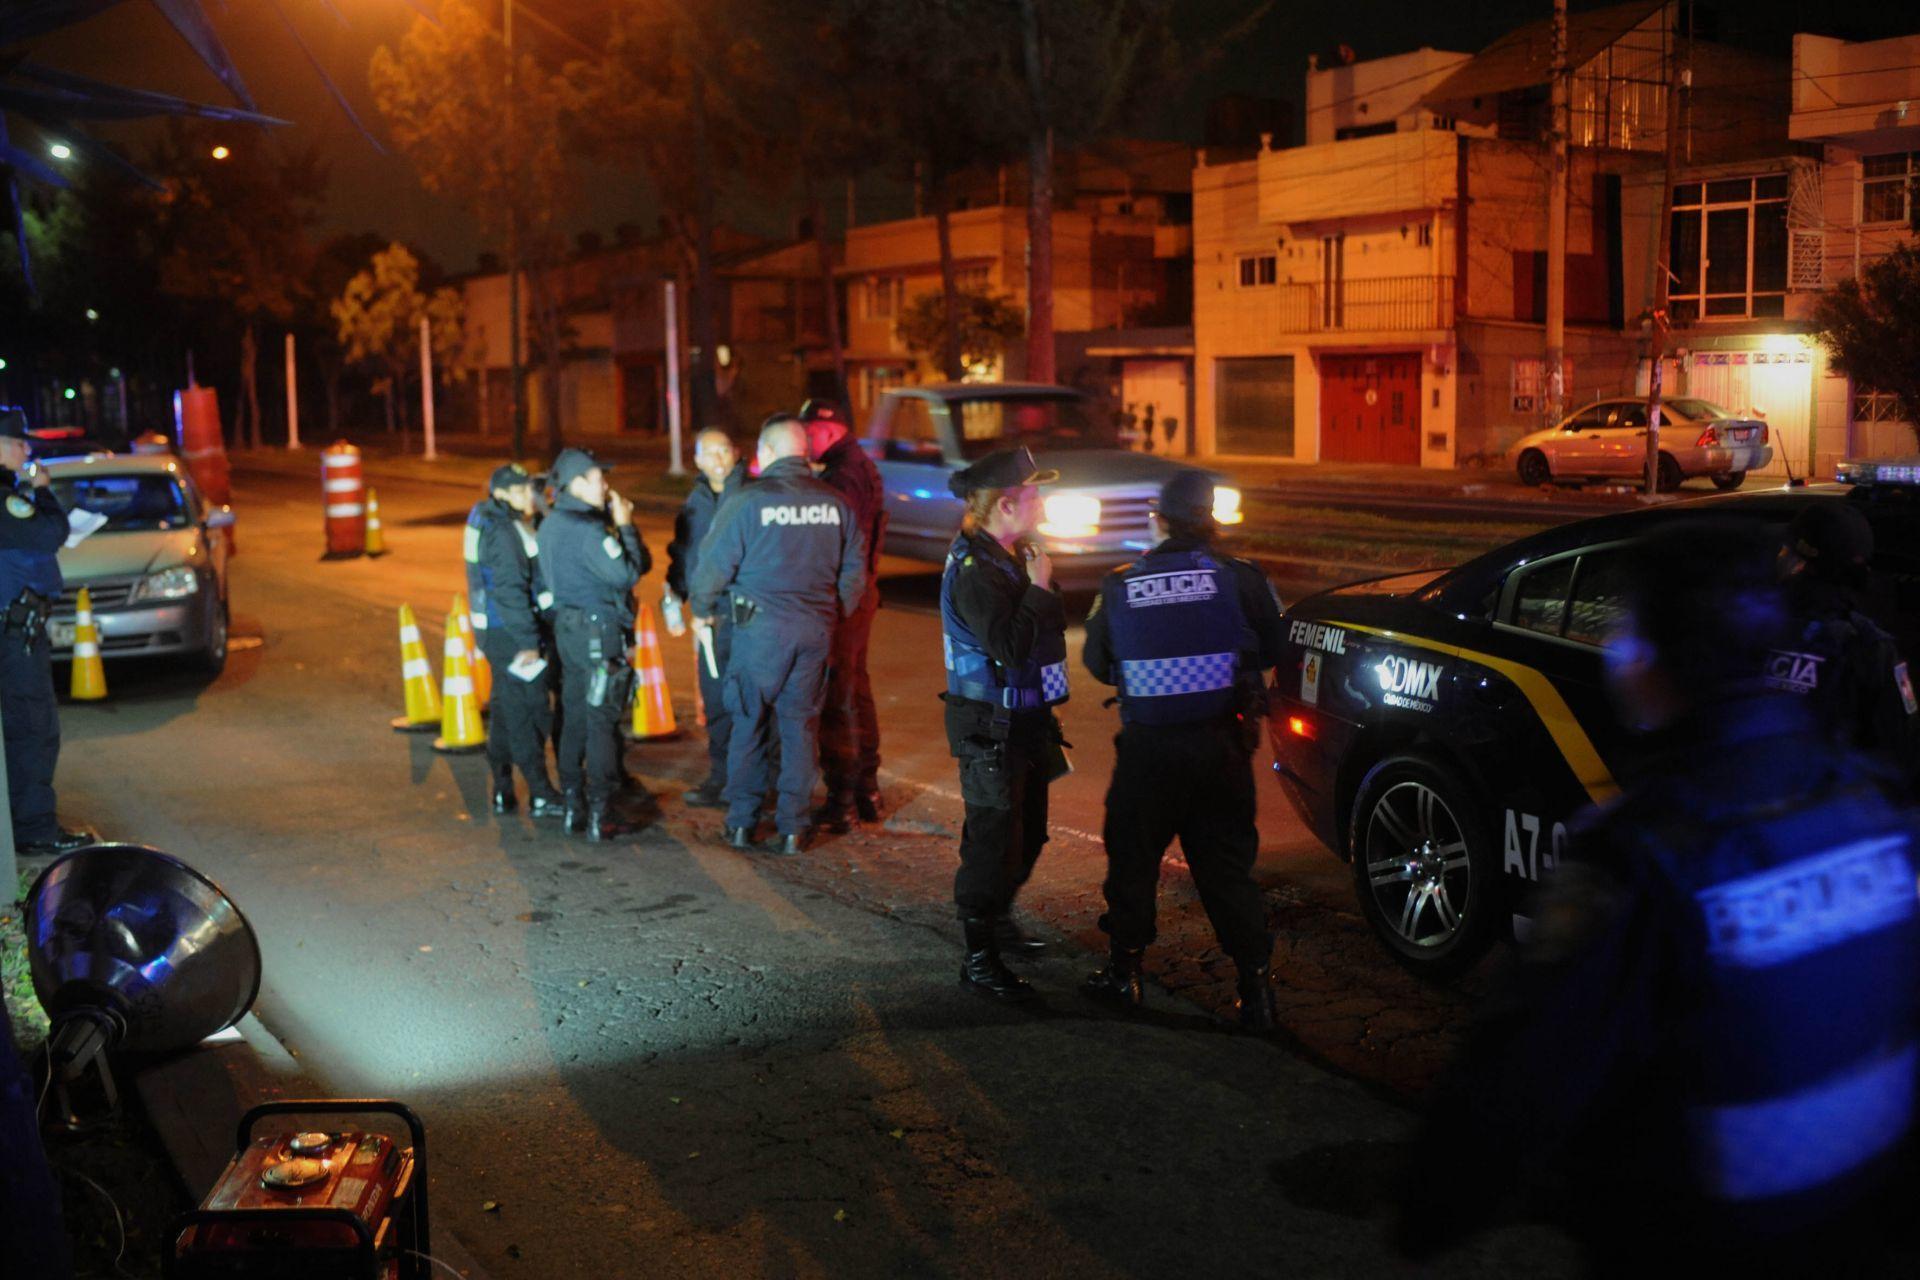 Atan con cinta a integrantes de una familia en Xochimilco para robar su casa